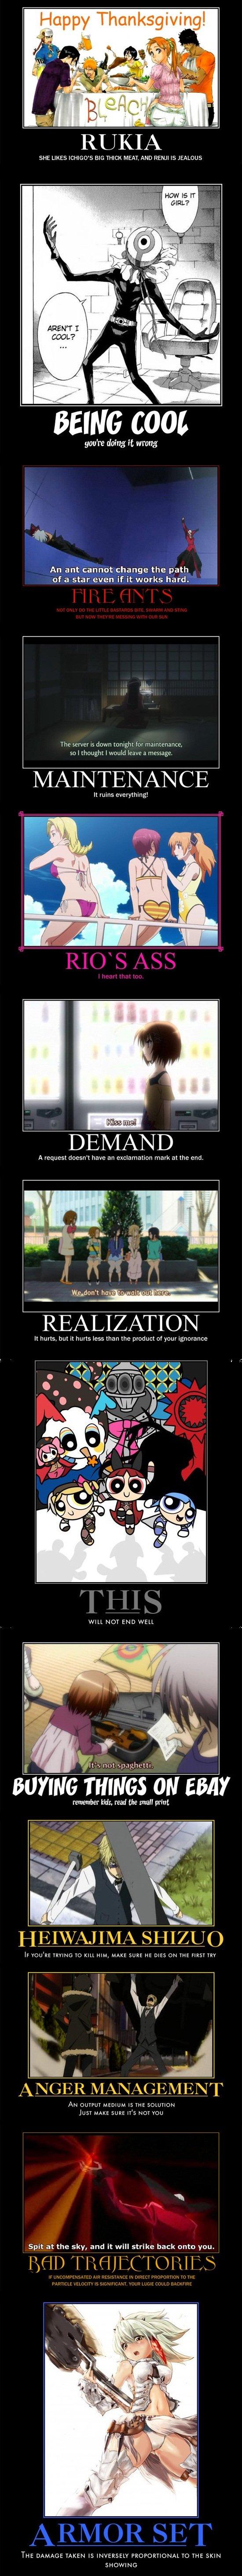 Anime Mot Posters 694. Found and Compiled, Not Made 1 - Bleach 2 - Future Diary 3,12 - Needless 4 - Oreimo 7 - K-on 8 - Powerpuff Girls / Madoka 10.11 - Durarar Anime mot posters